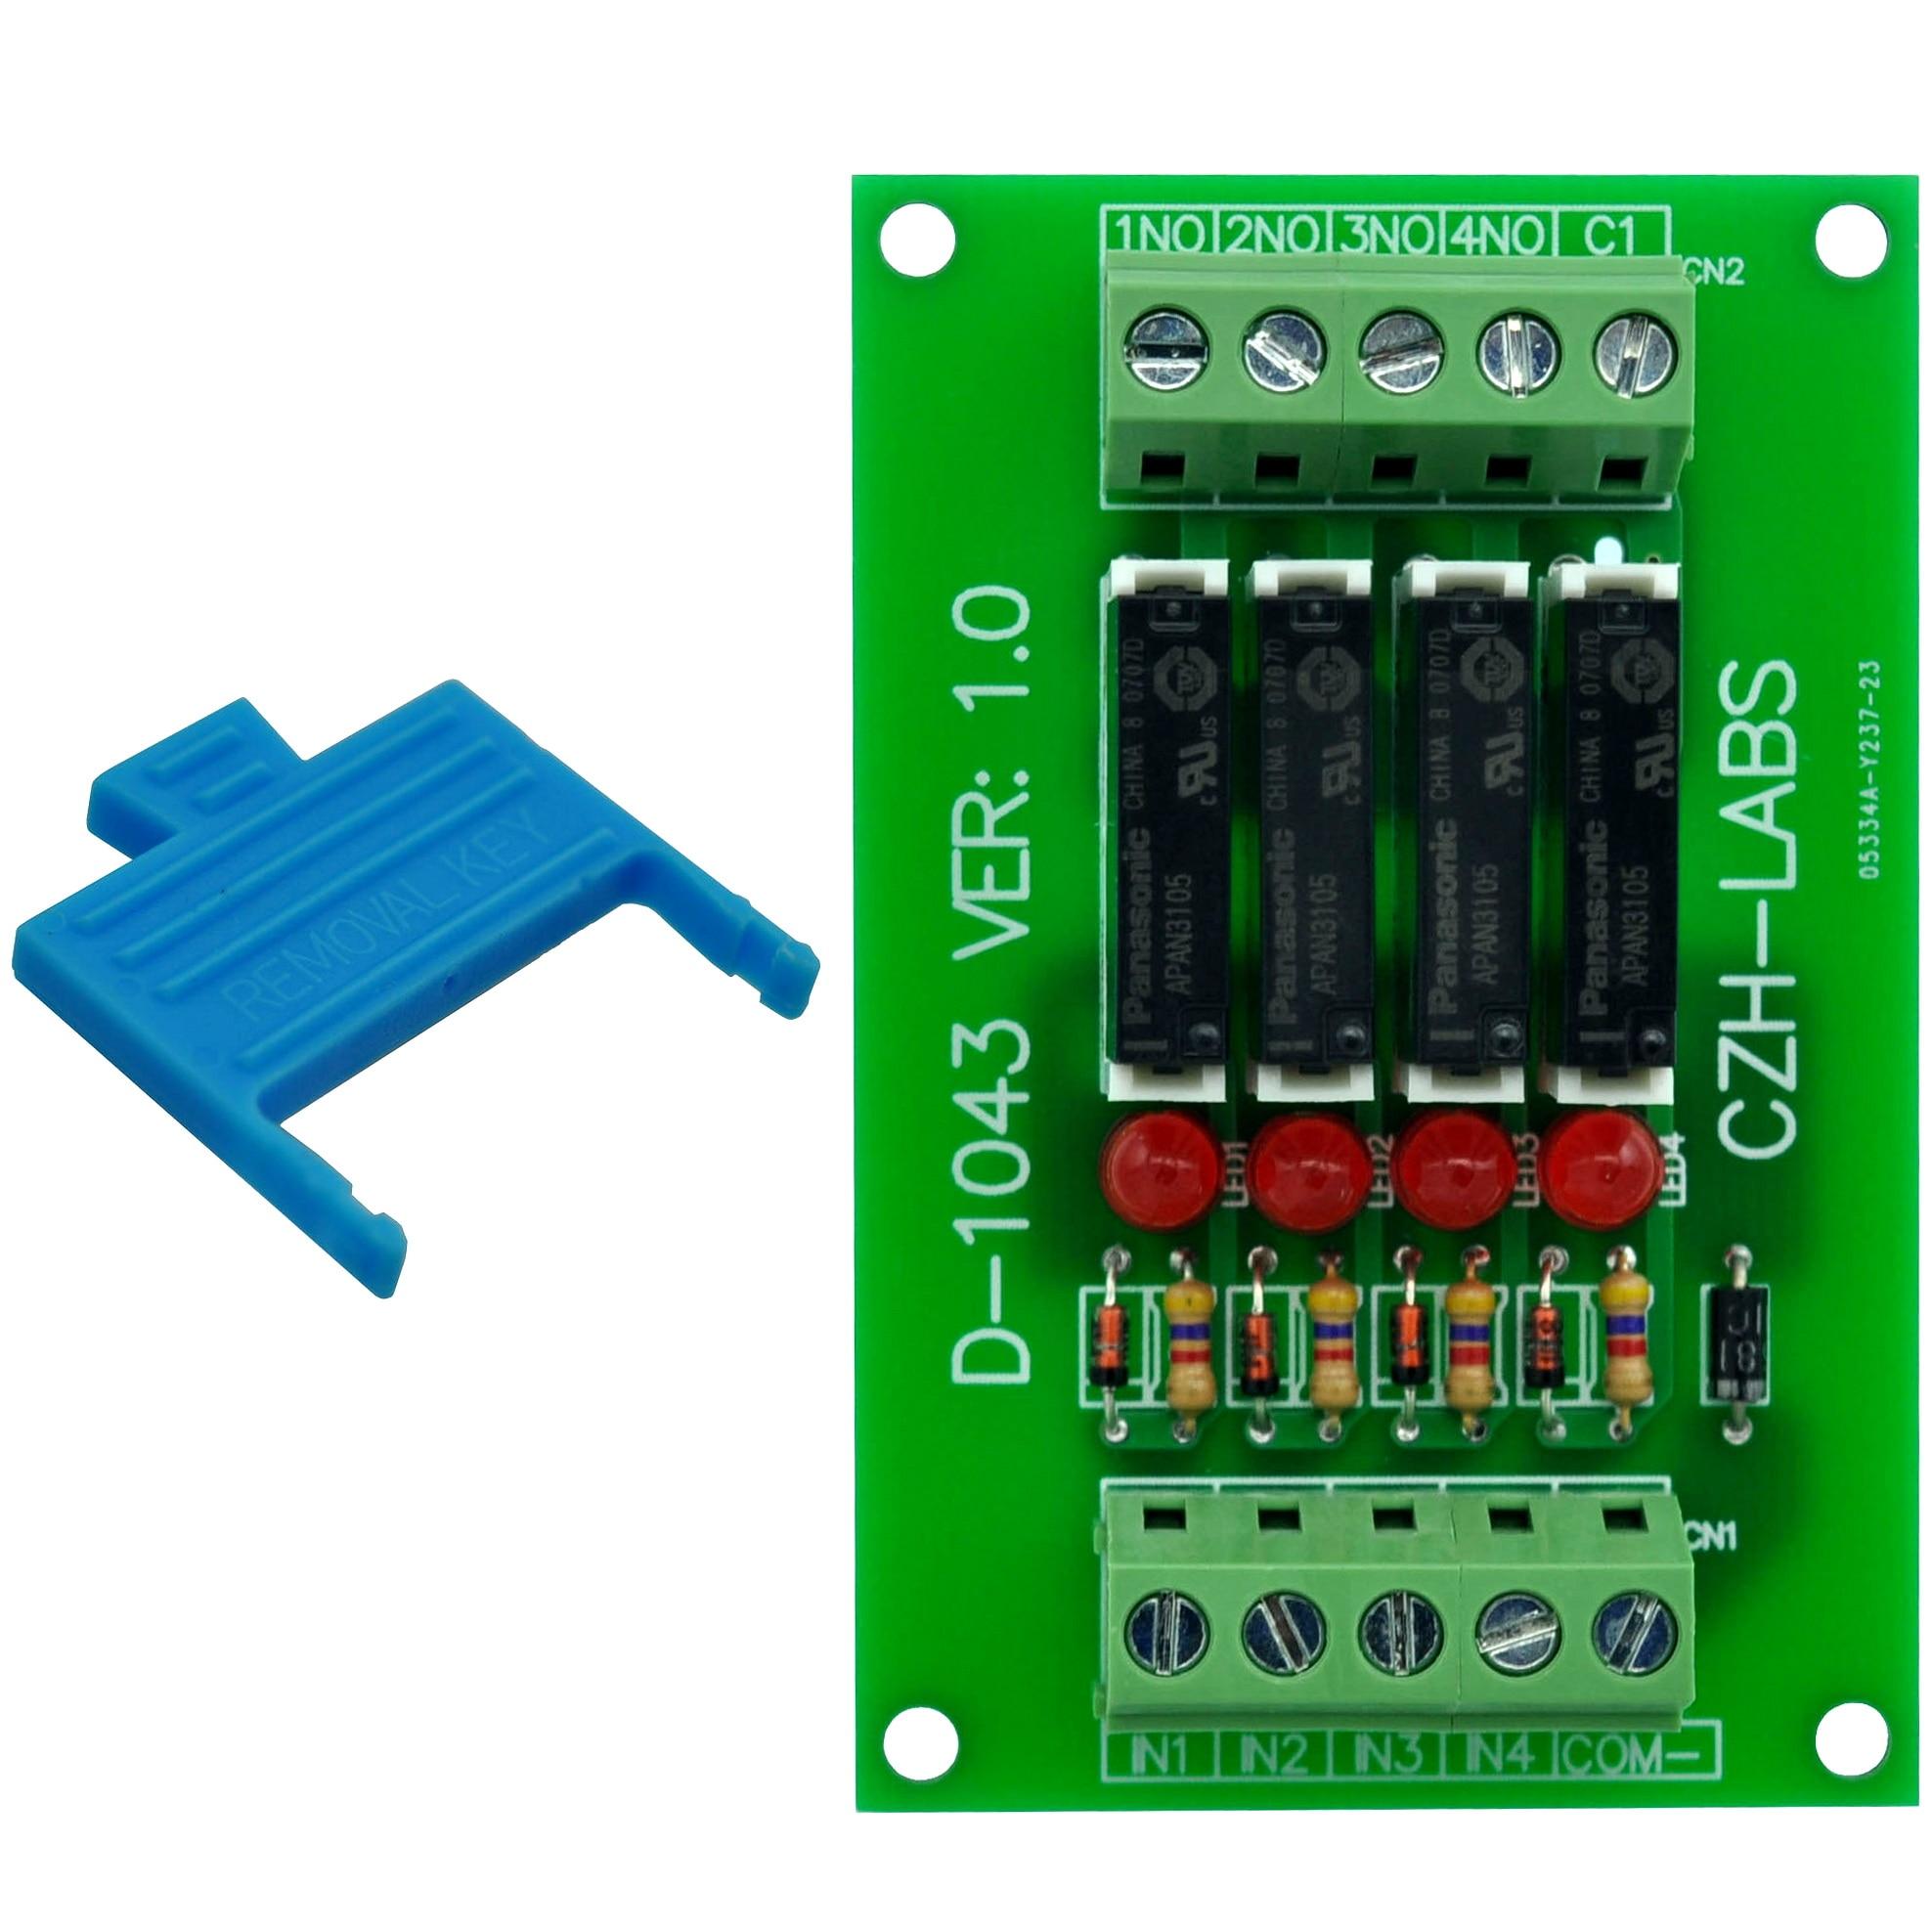 Slim Panel Mount DC5V Source/PNP 4 SPST-NO 5A Power Relay Module, APAN3105.